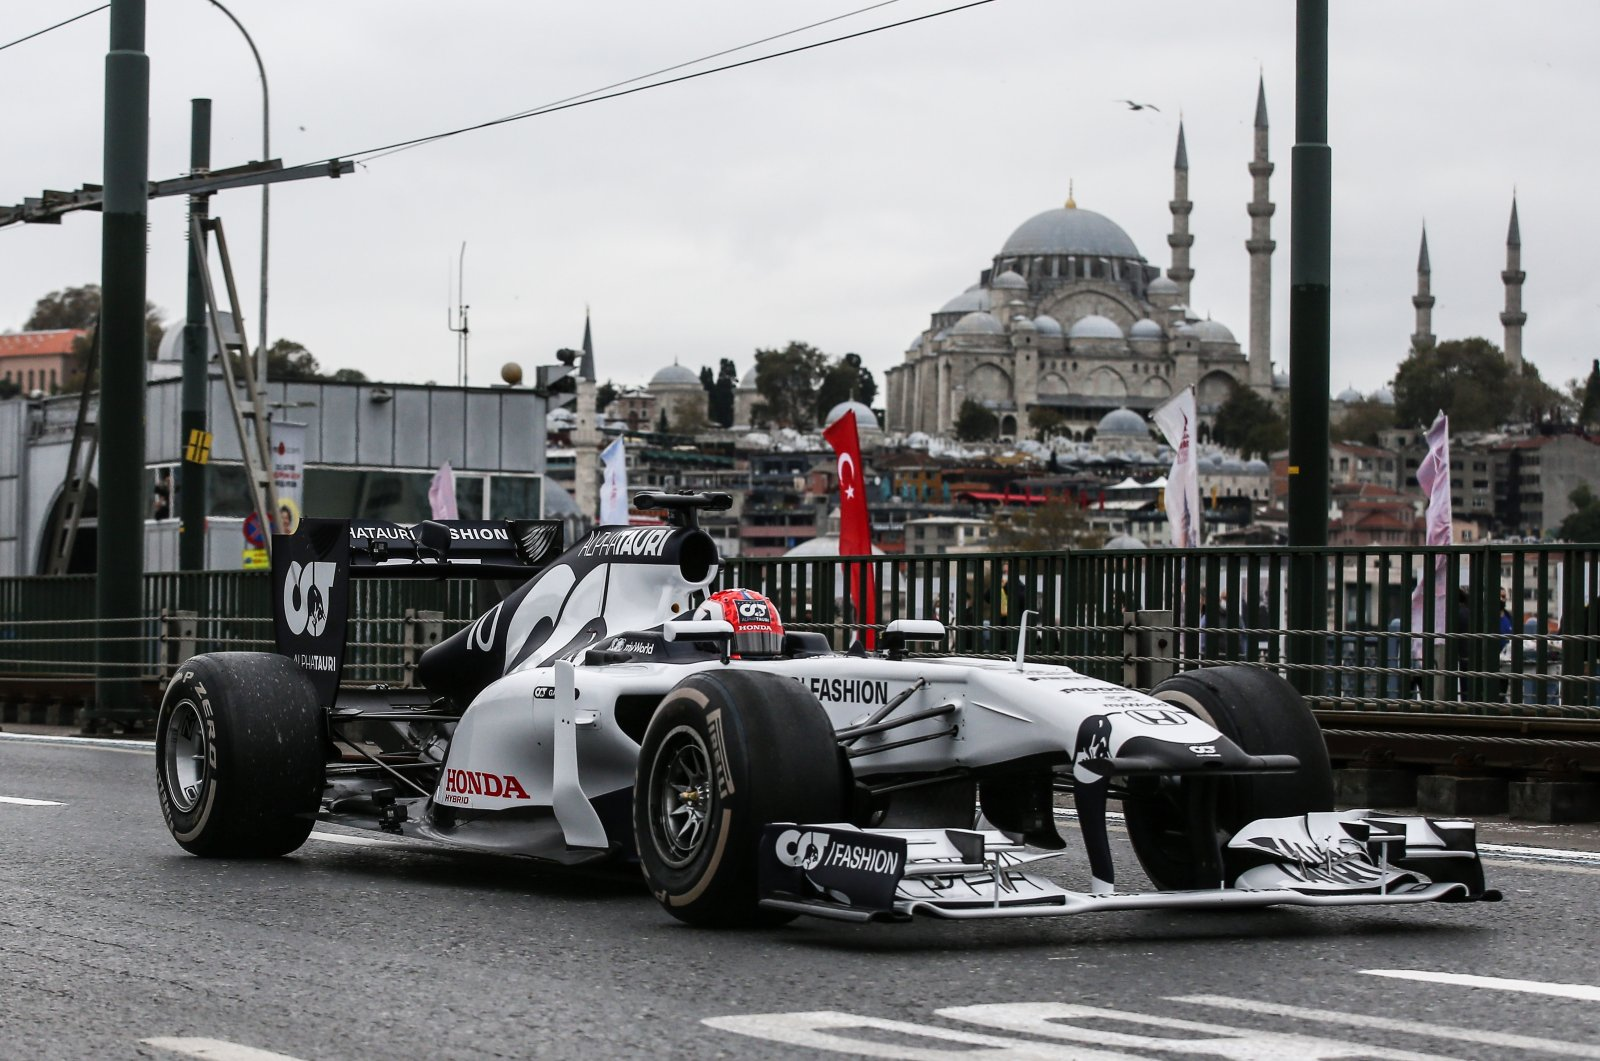 An AlphaTauri Formula One race car crosses Galata Bridge in the historic Eminönü neighborhood of Istanbul, Turkey, Nov. 10, 2020. (AA Photo)